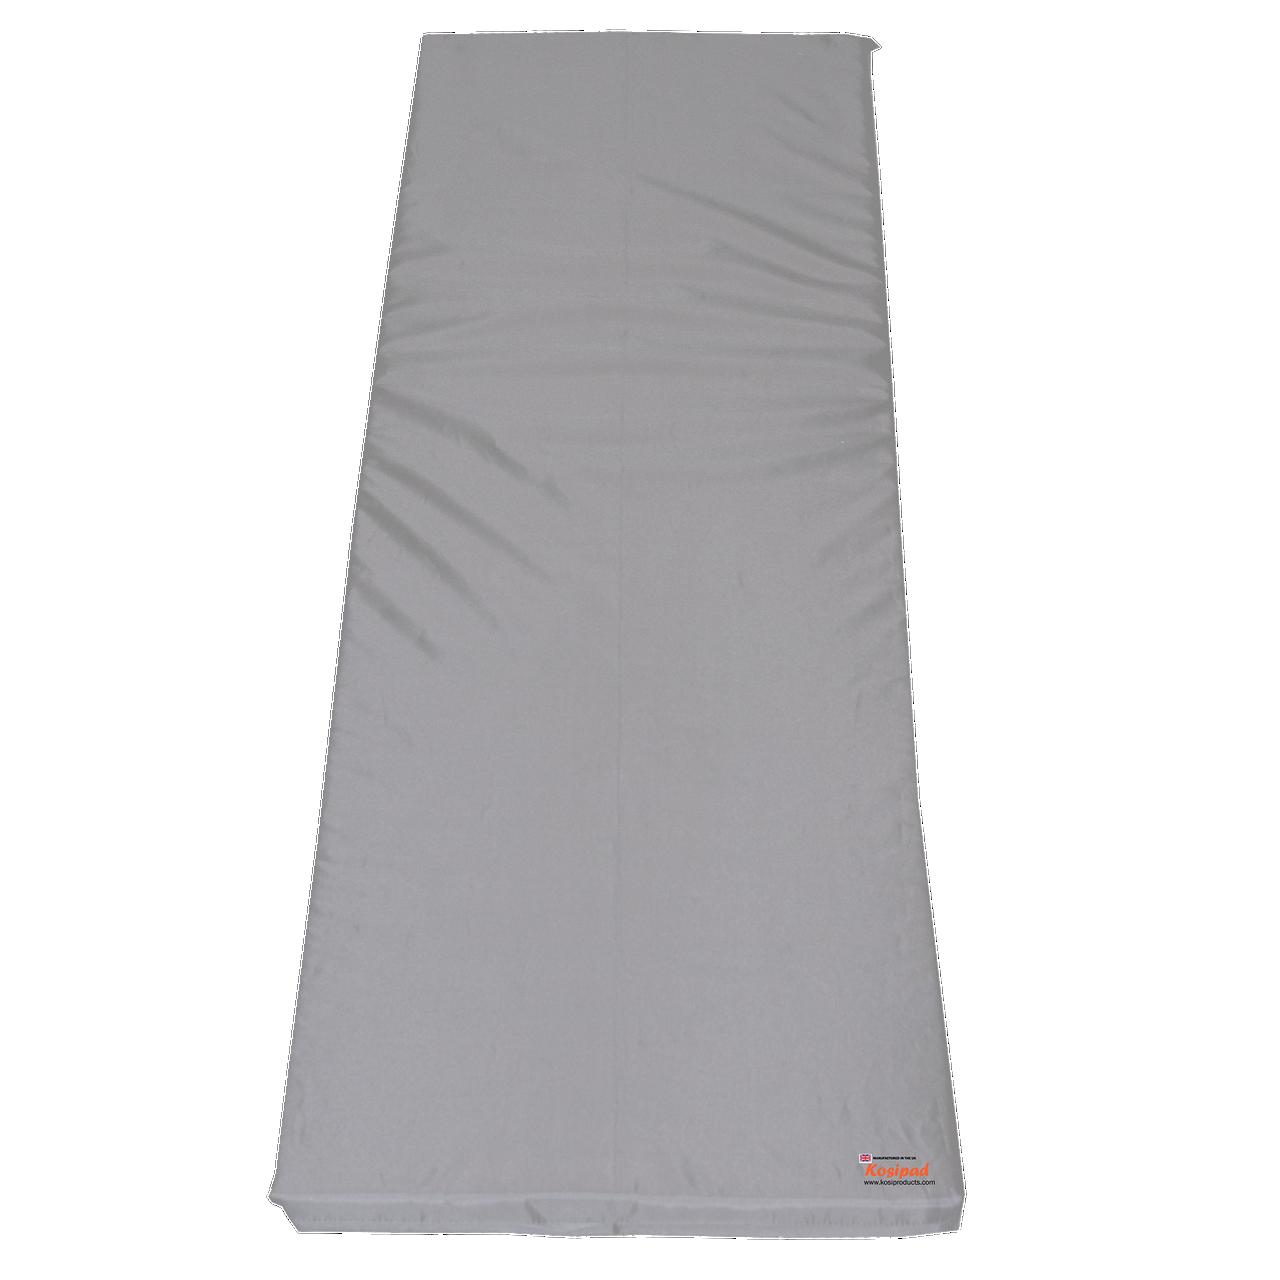 KosiPad Waterproof Sun Lounger Mattress For Garden Sunburst Grey